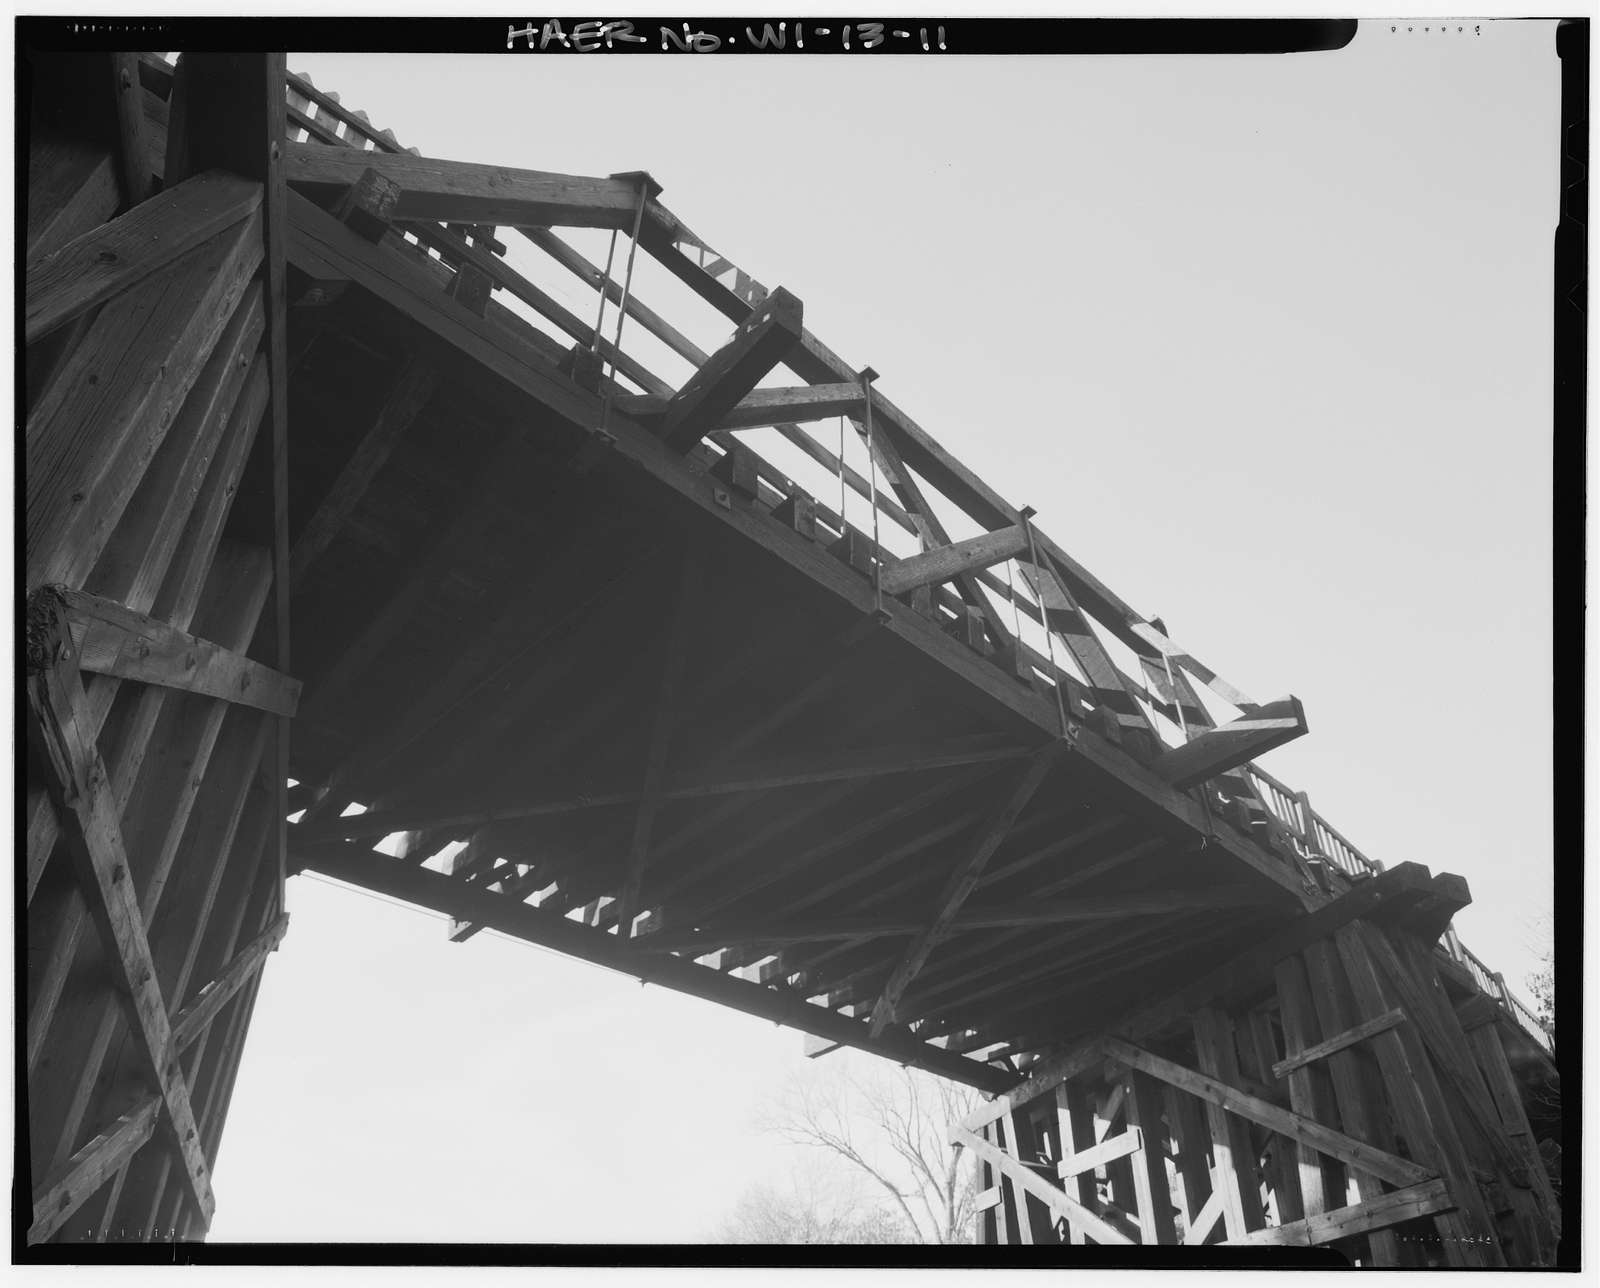 Seventh Street Bridge, Spanning Chicago, St.Paul, Minneapolis,Omaha Railroad, Hudson, St. Croix County, WI